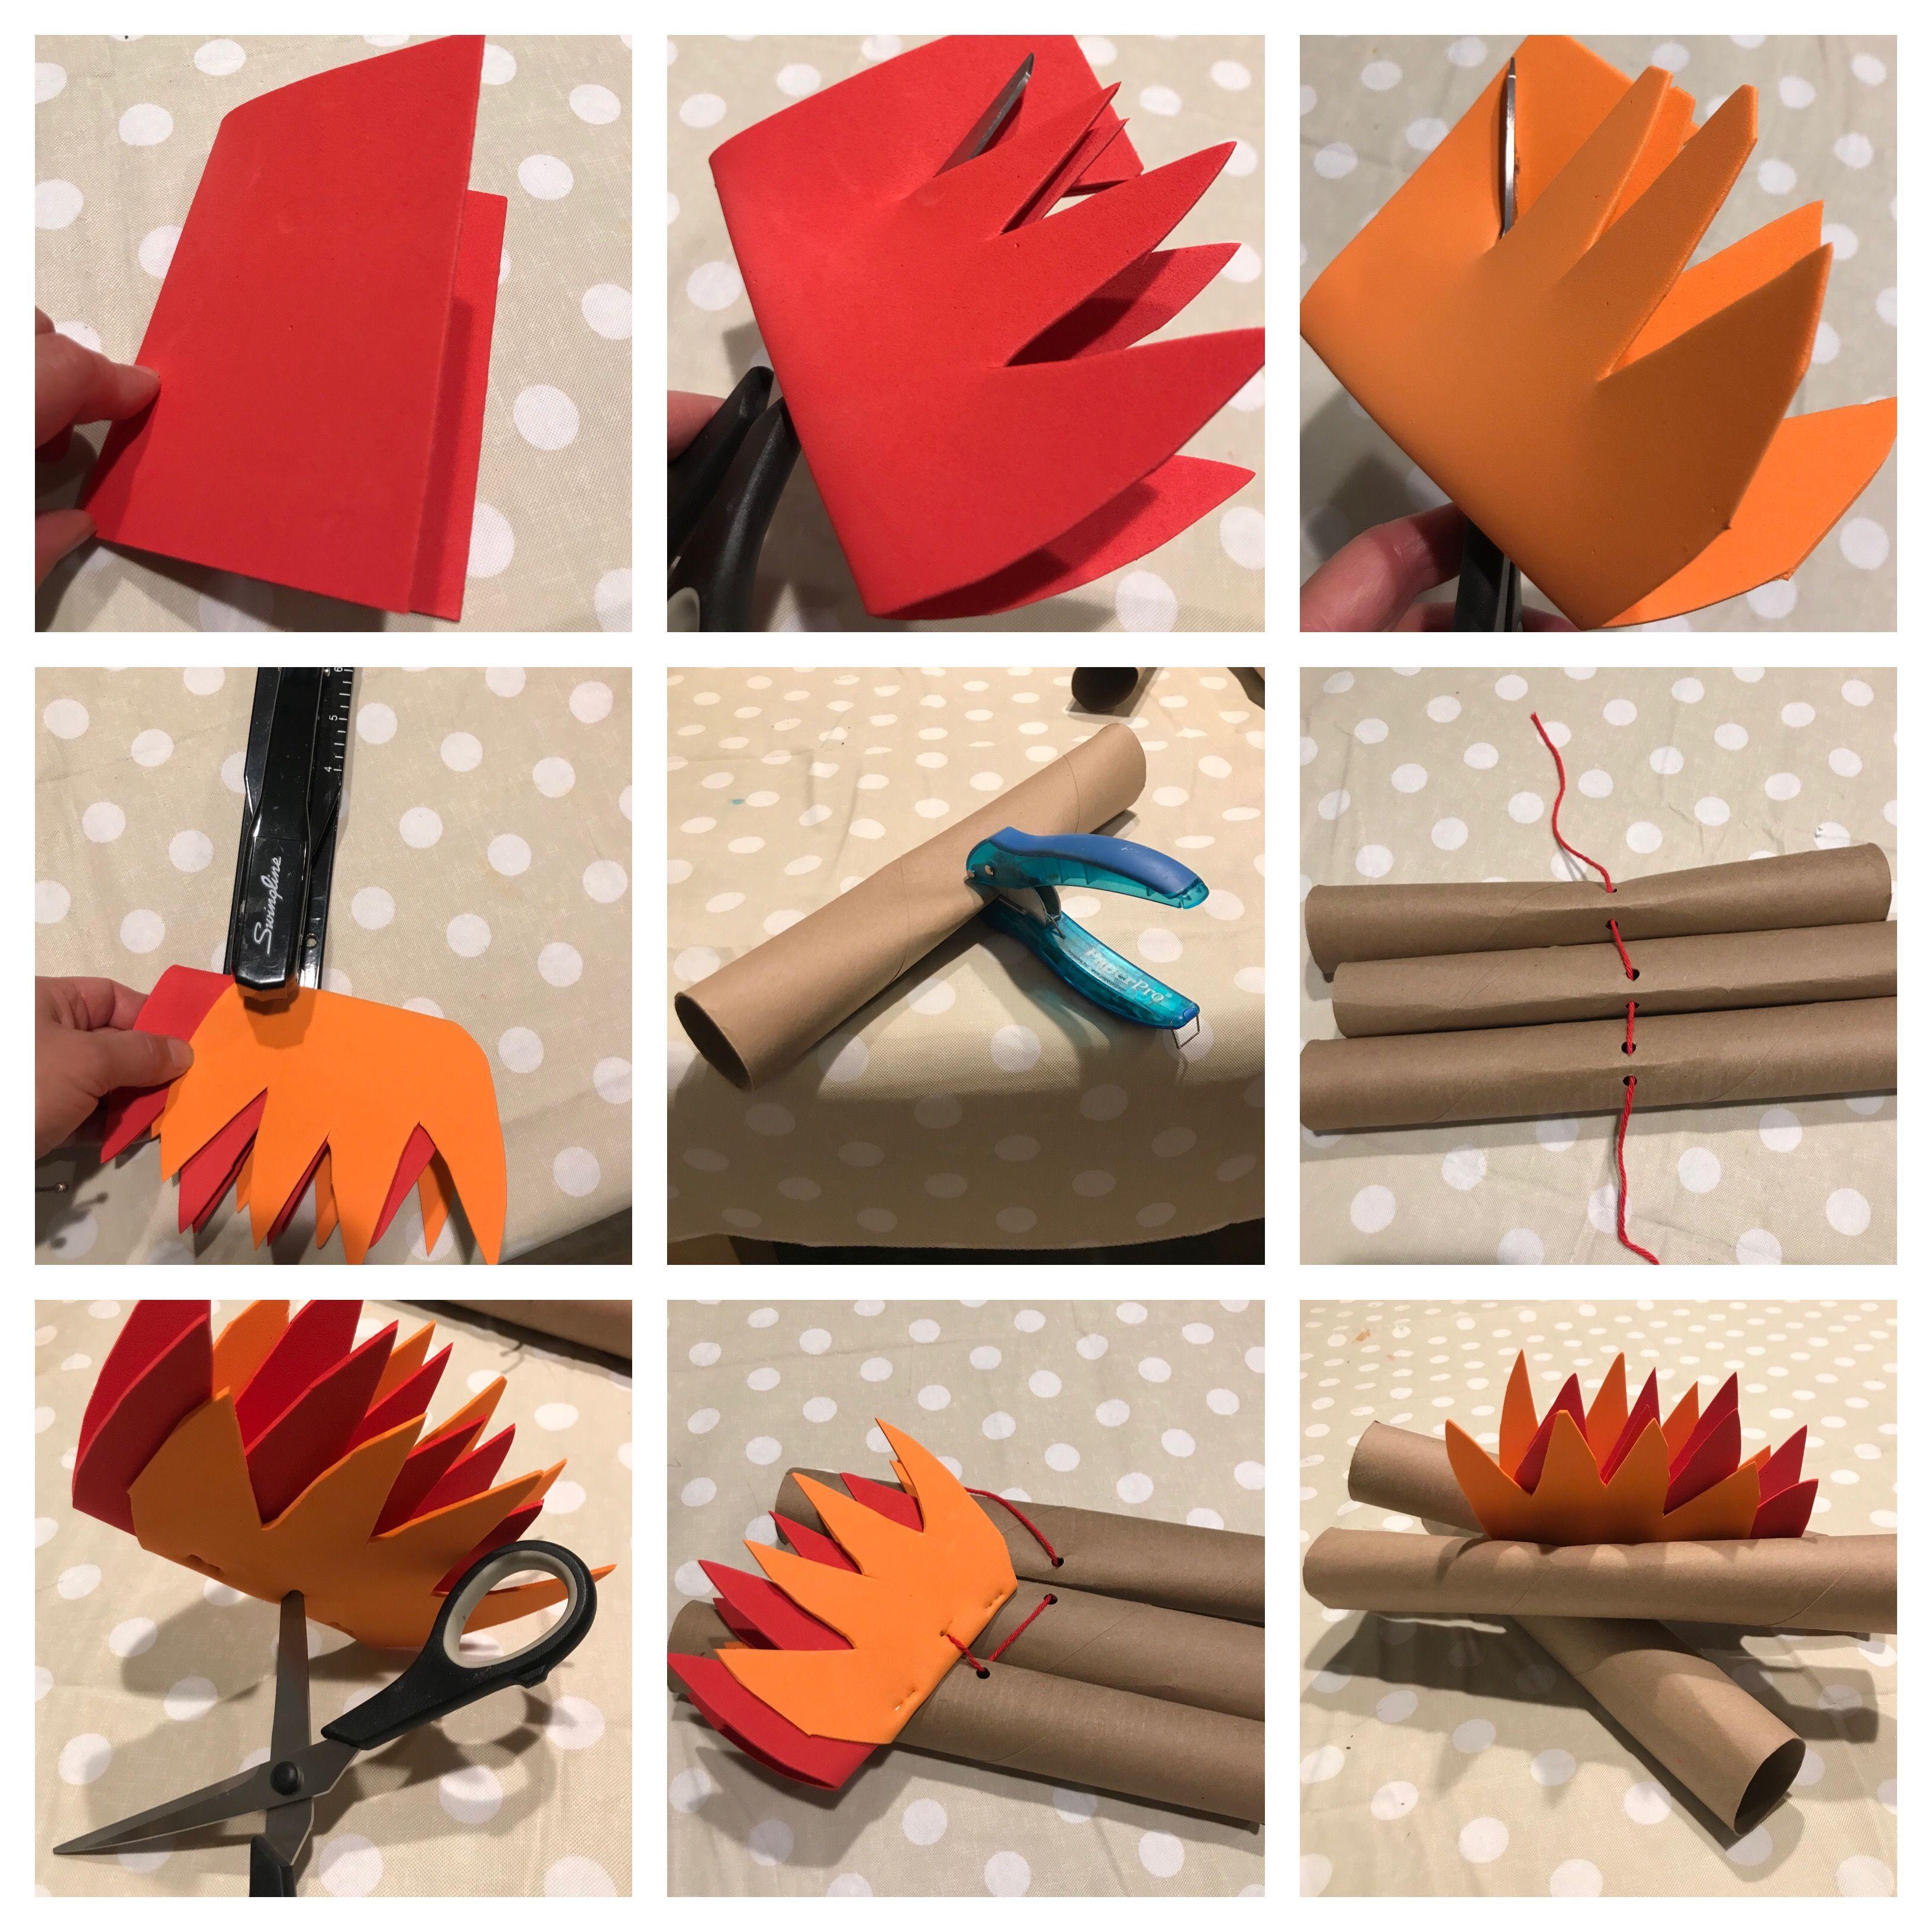 18+ Paper towel roll crafts for preschoolers ideas